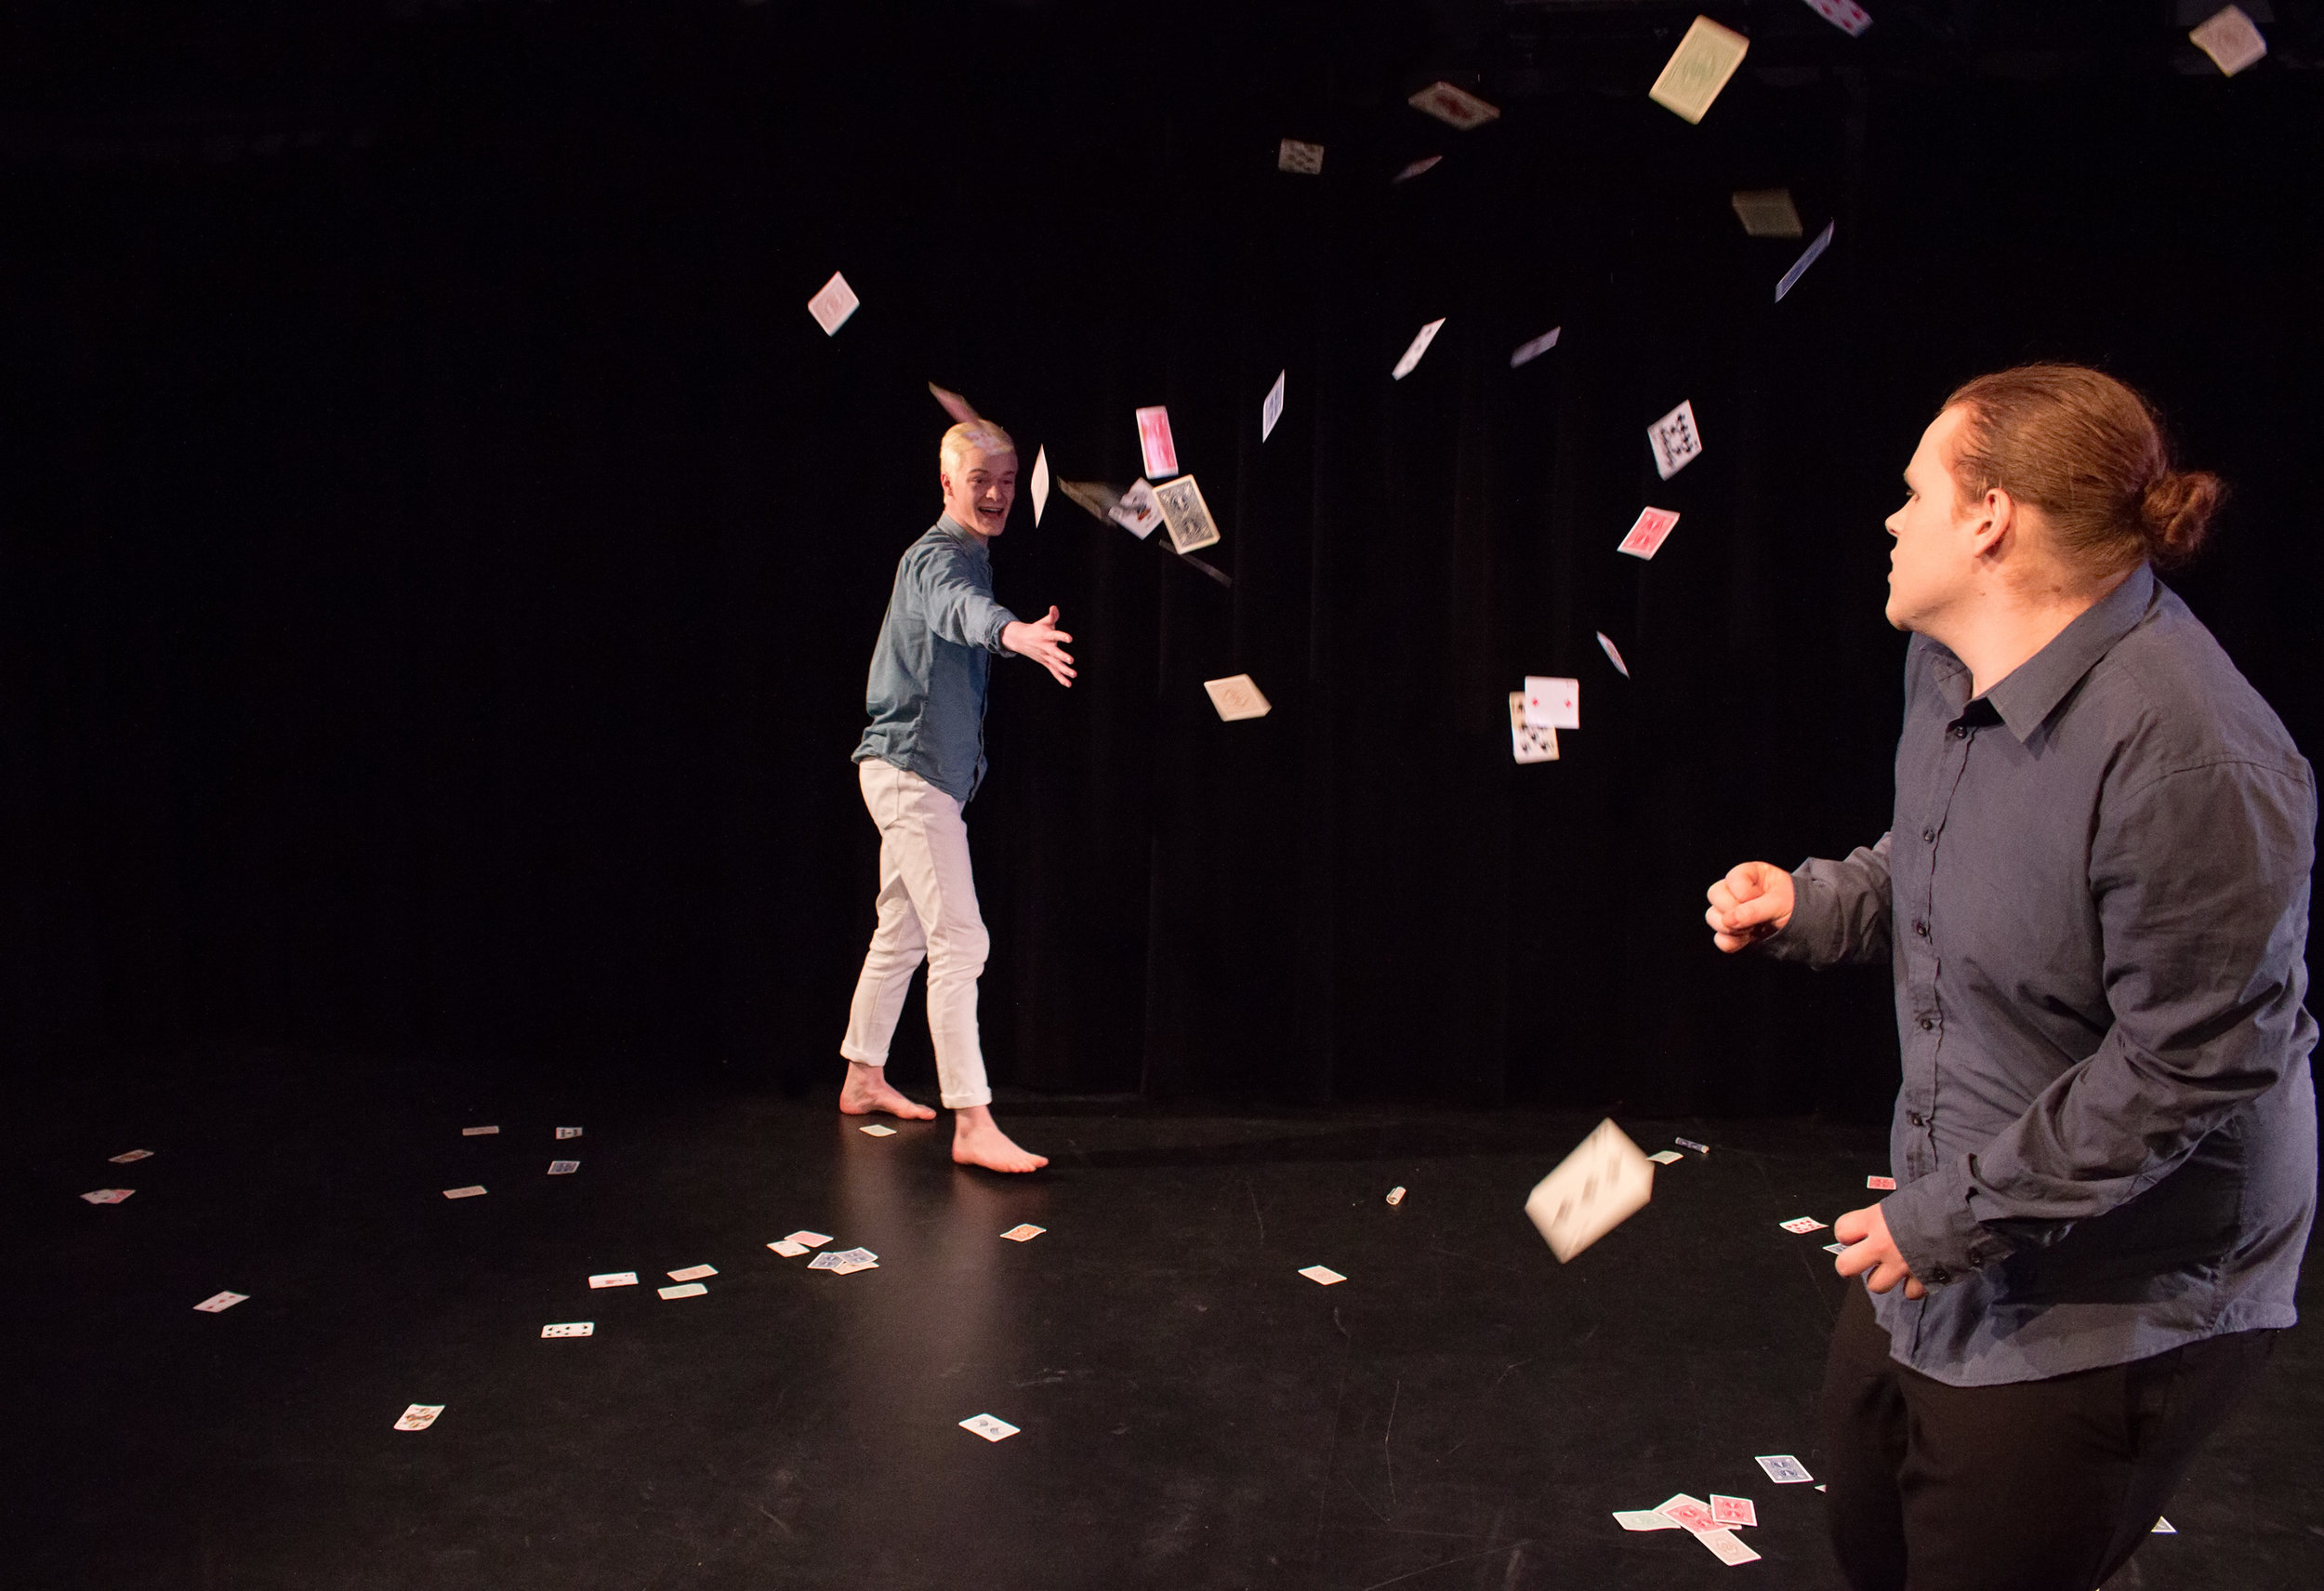 manusplere - tjg. tak-tickertheater junge generation, DresdenPremiere am 21.04.2017